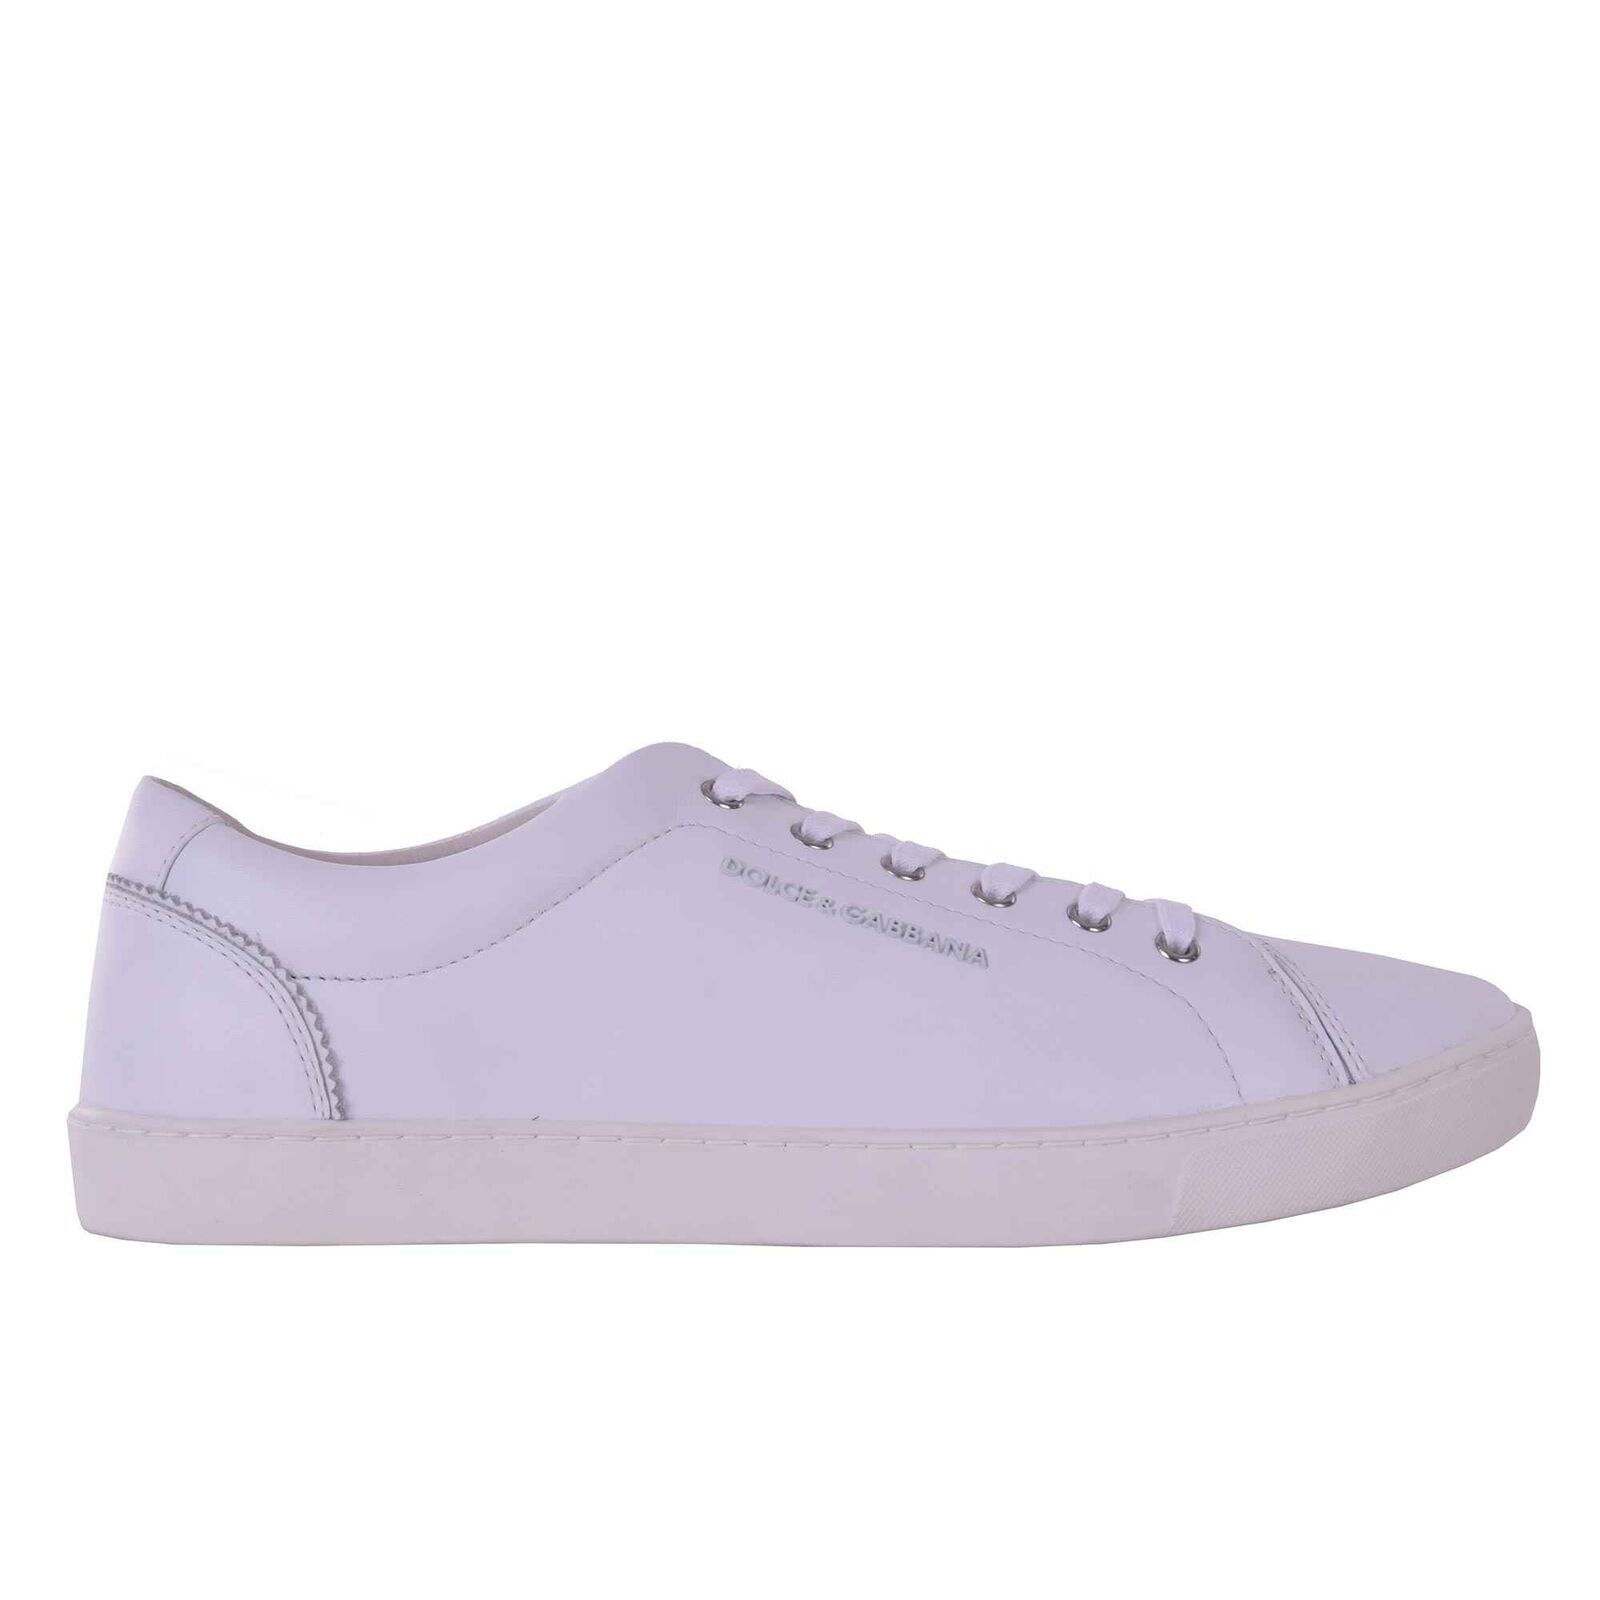 DOLCE & GABBANA Klassische Leder Sneakers Schuhe NEU RU mit Logo Weiss 05934